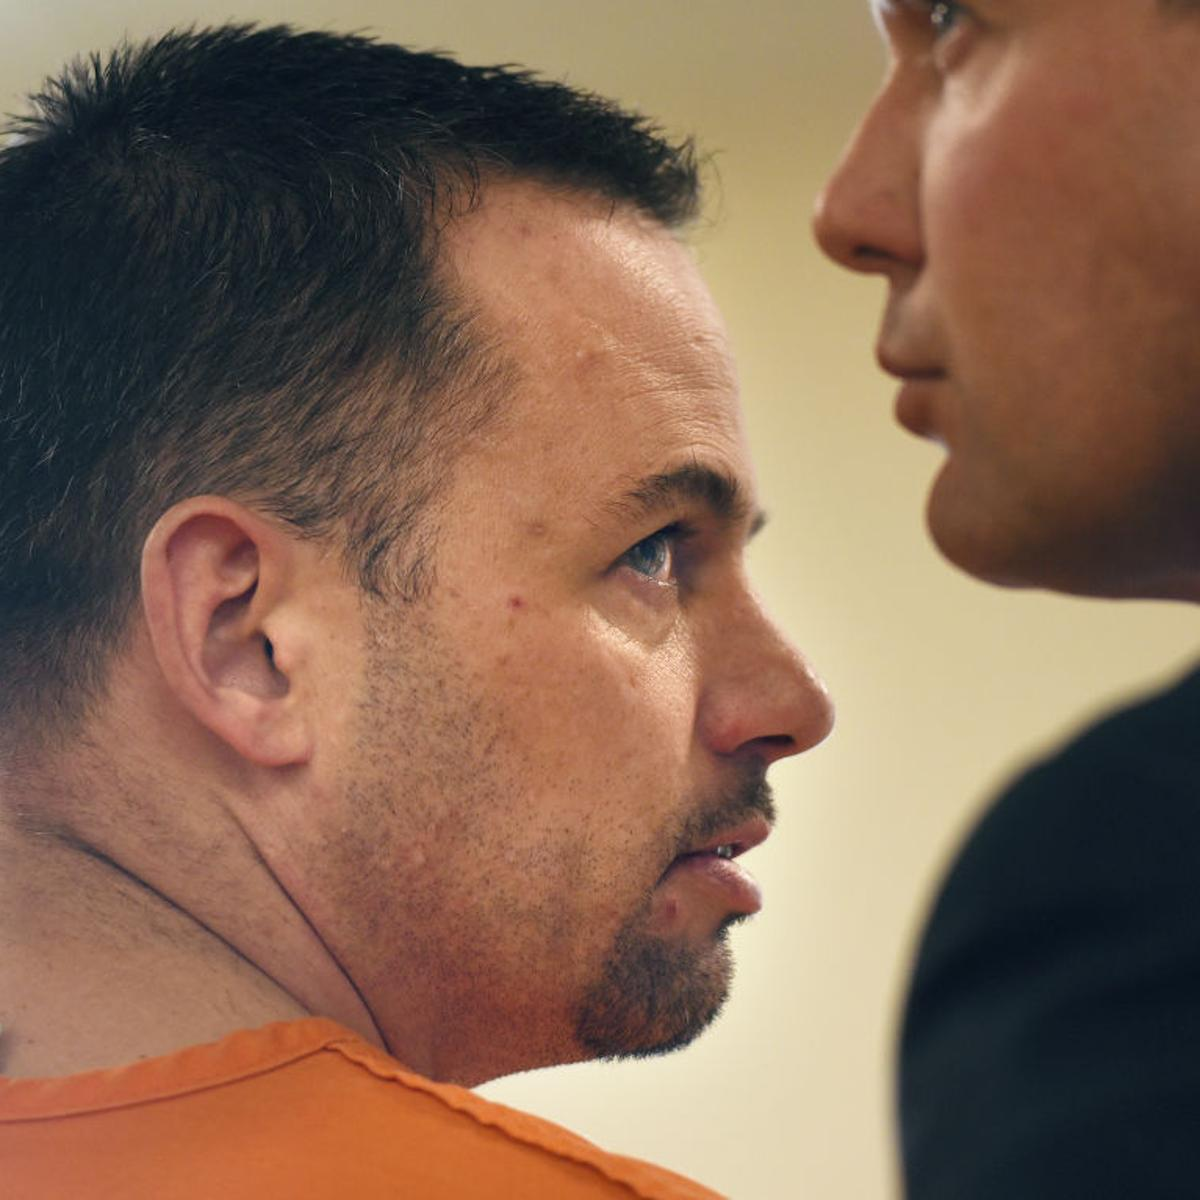 Man Who Attacked Girlfriend At Missoula Motel Sentenced To Prison Local Ravallirepublic Com